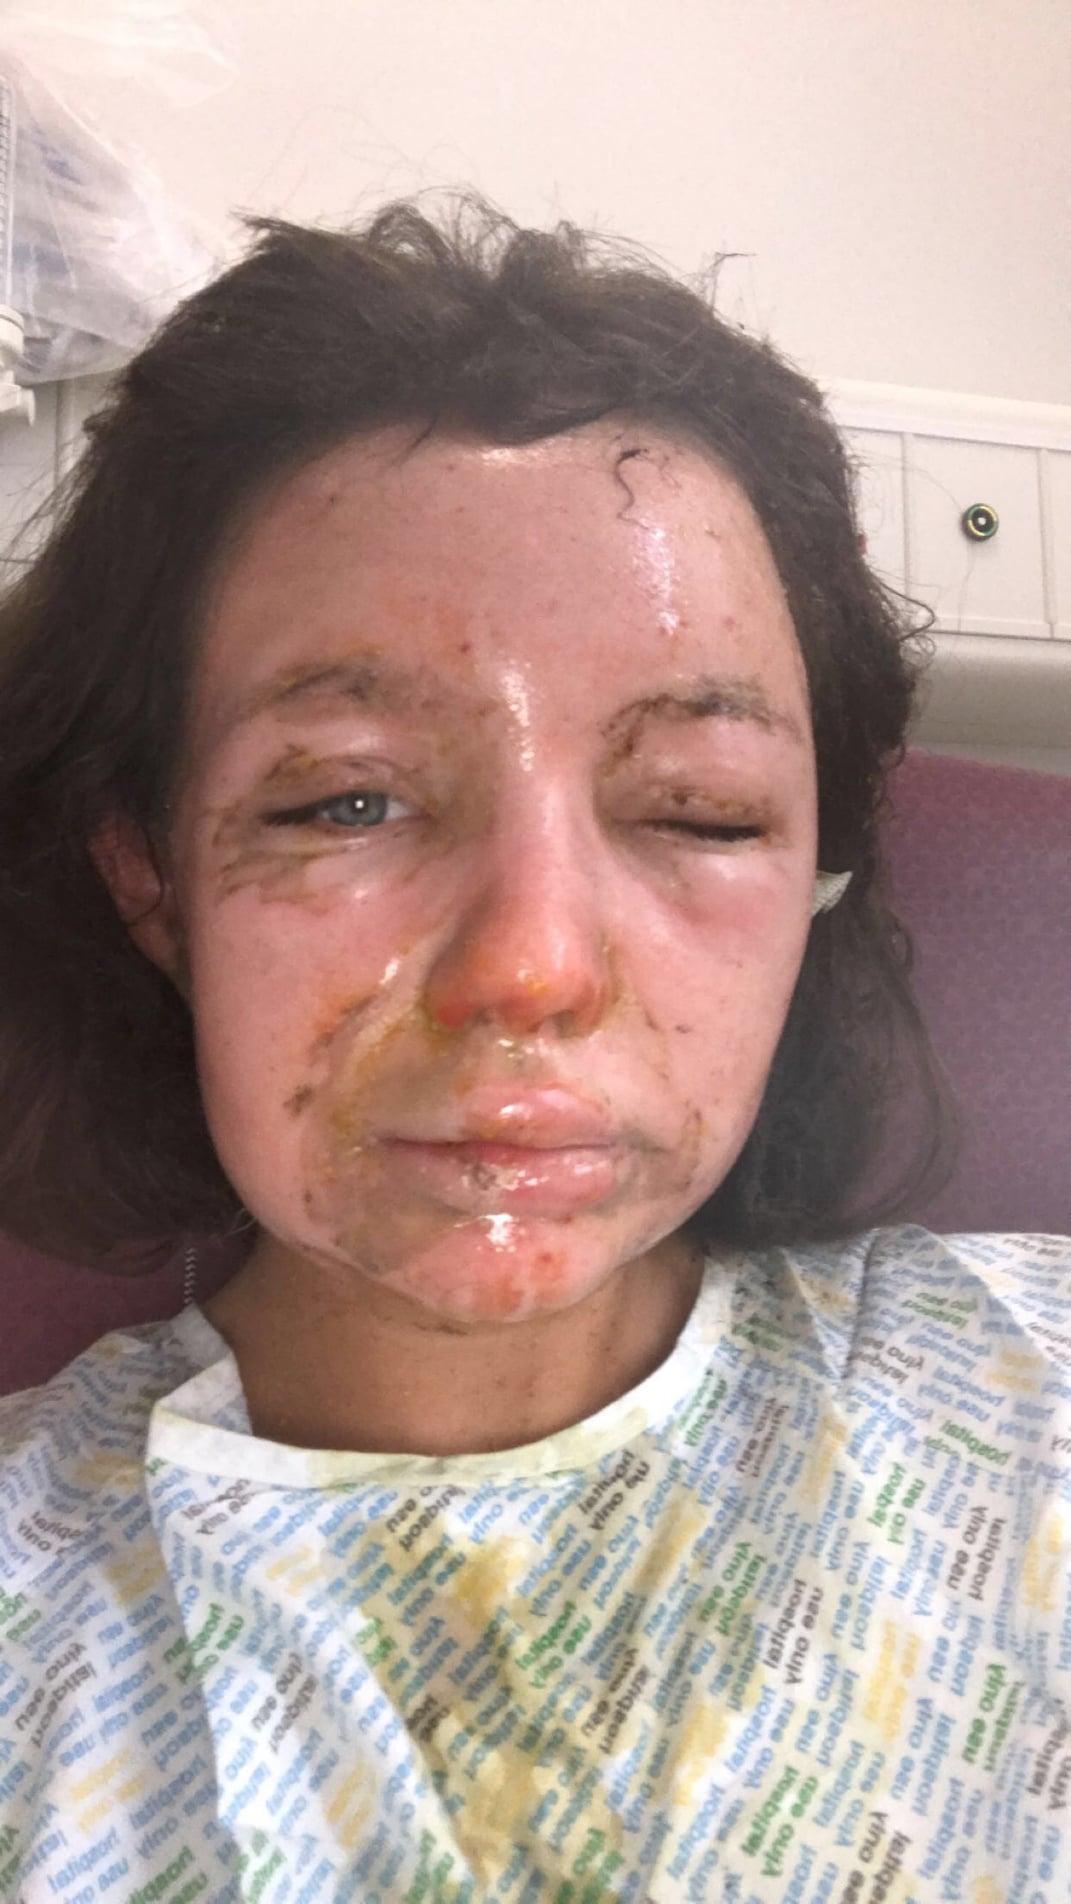 Grace Owen facial burns